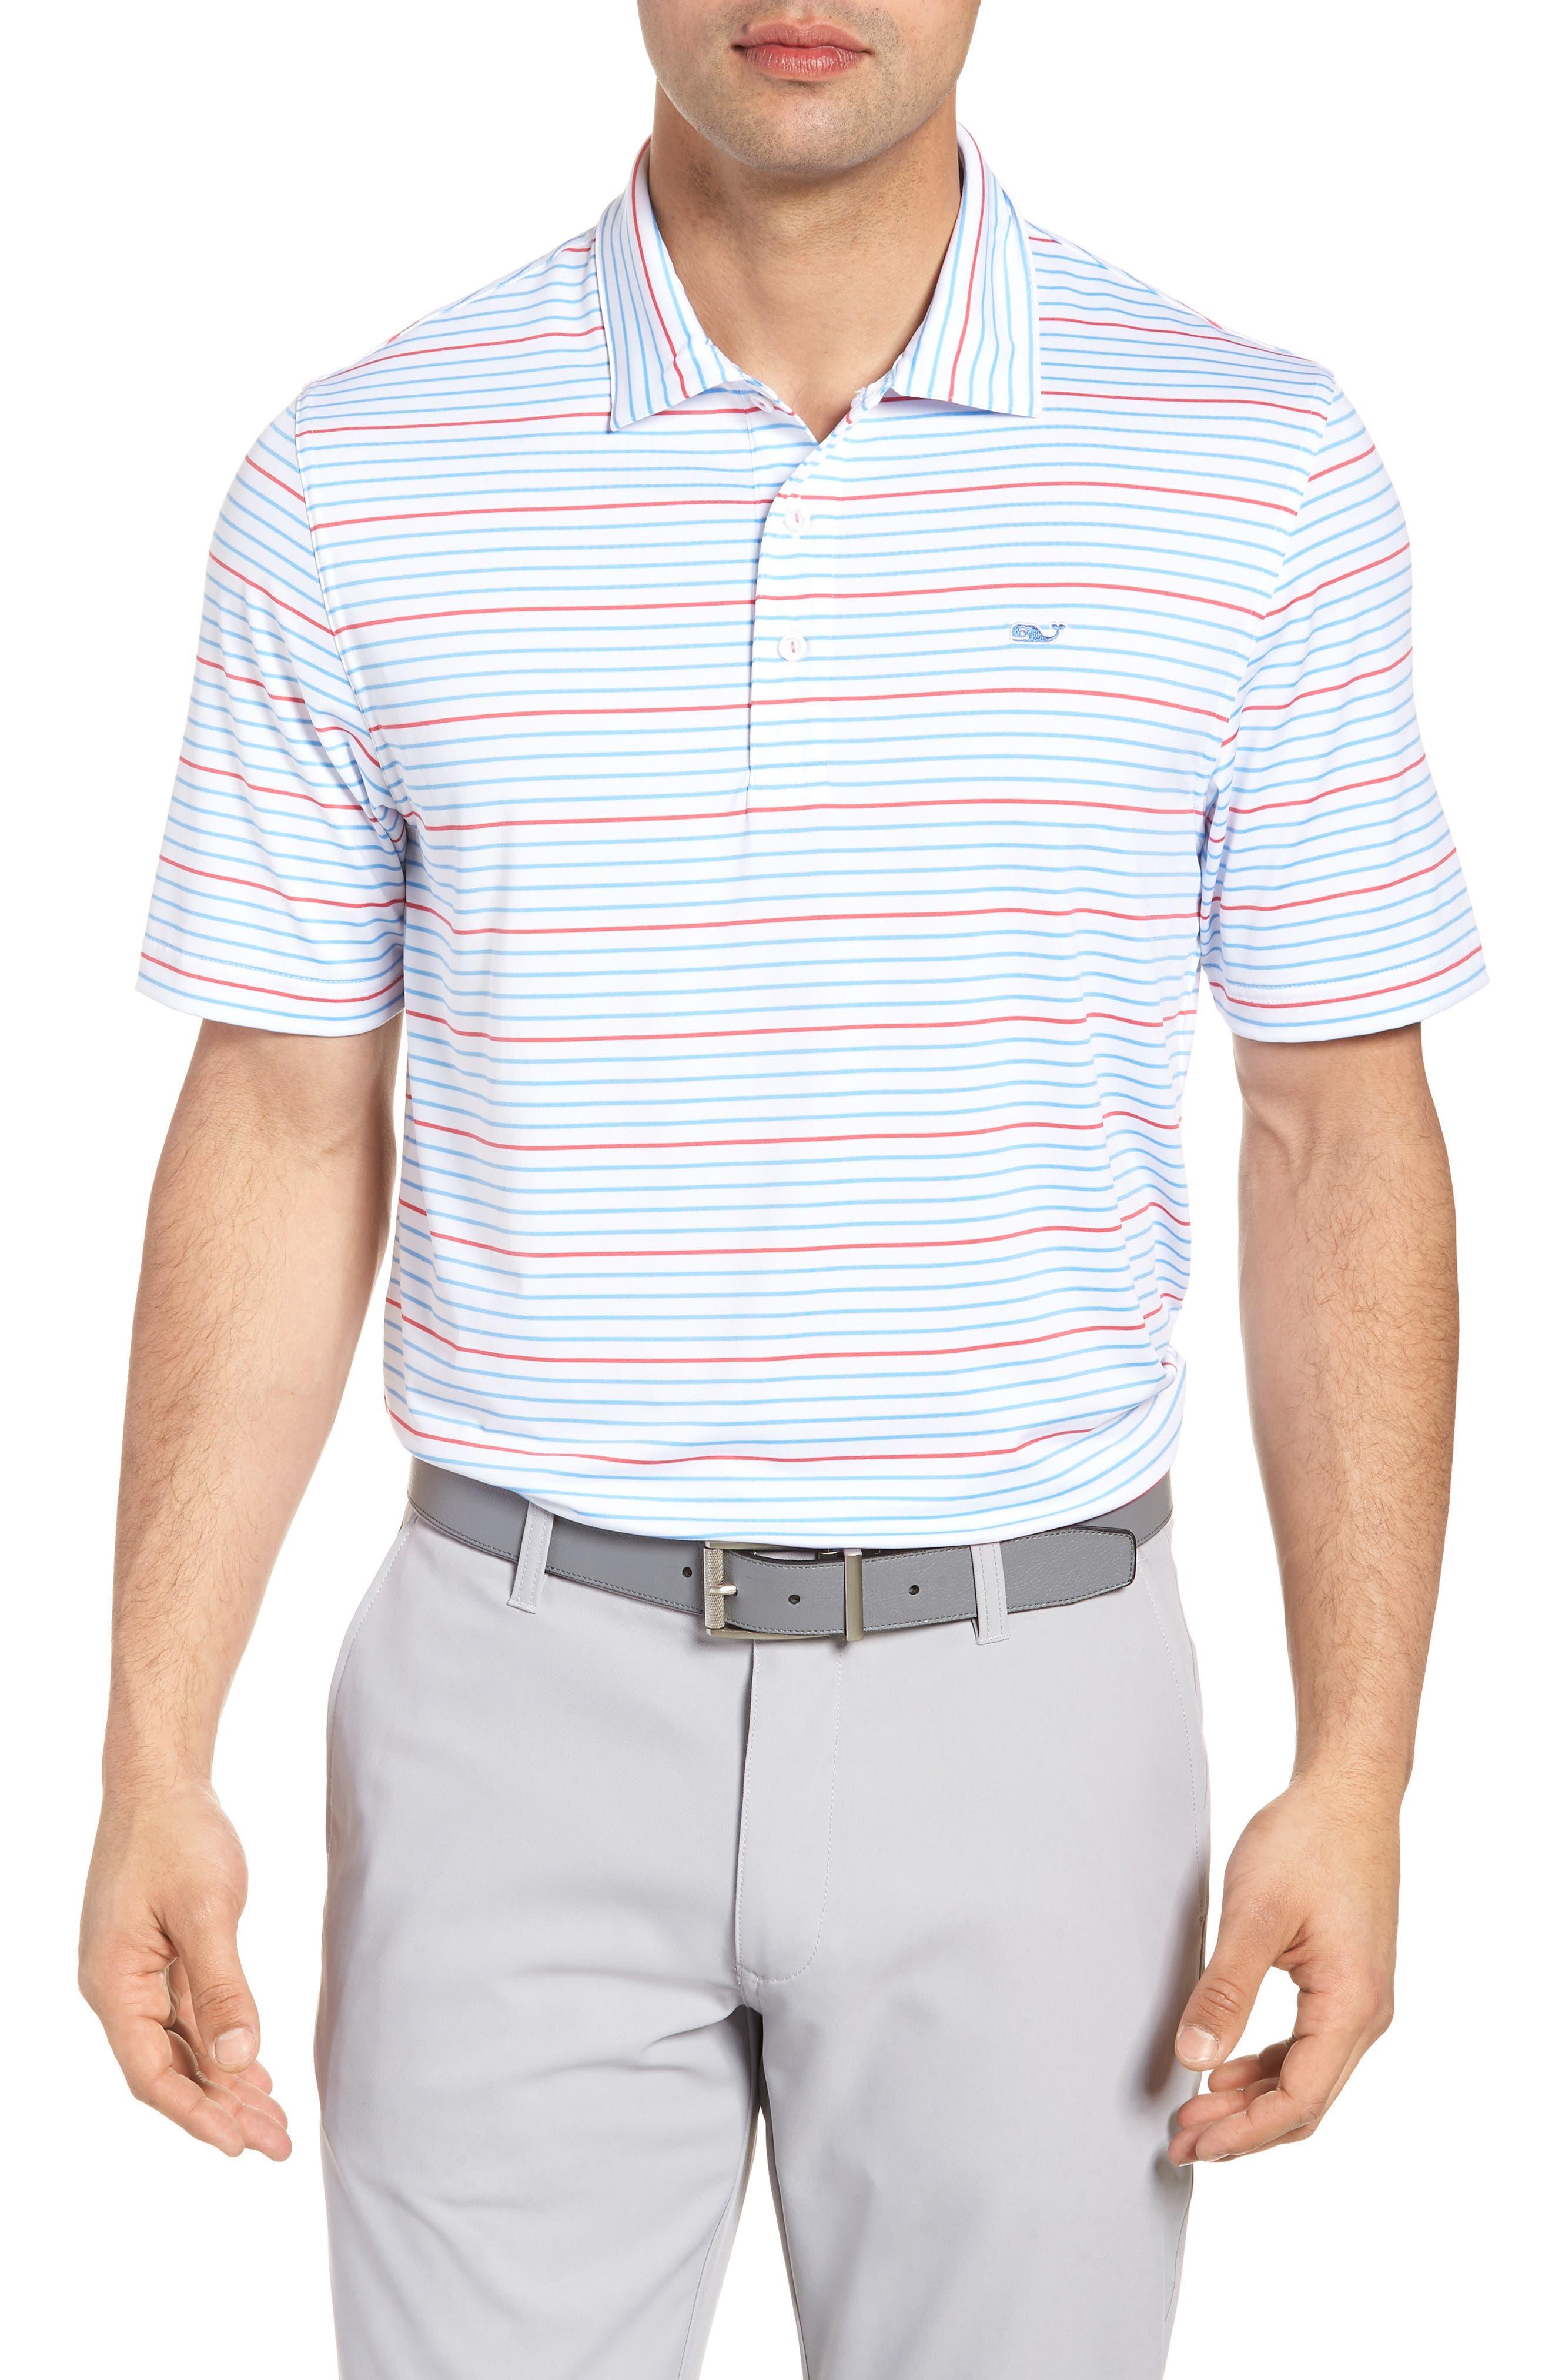 Swindell Stretch Stripe Polo,                             Main thumbnail 1, color,                             White Cap